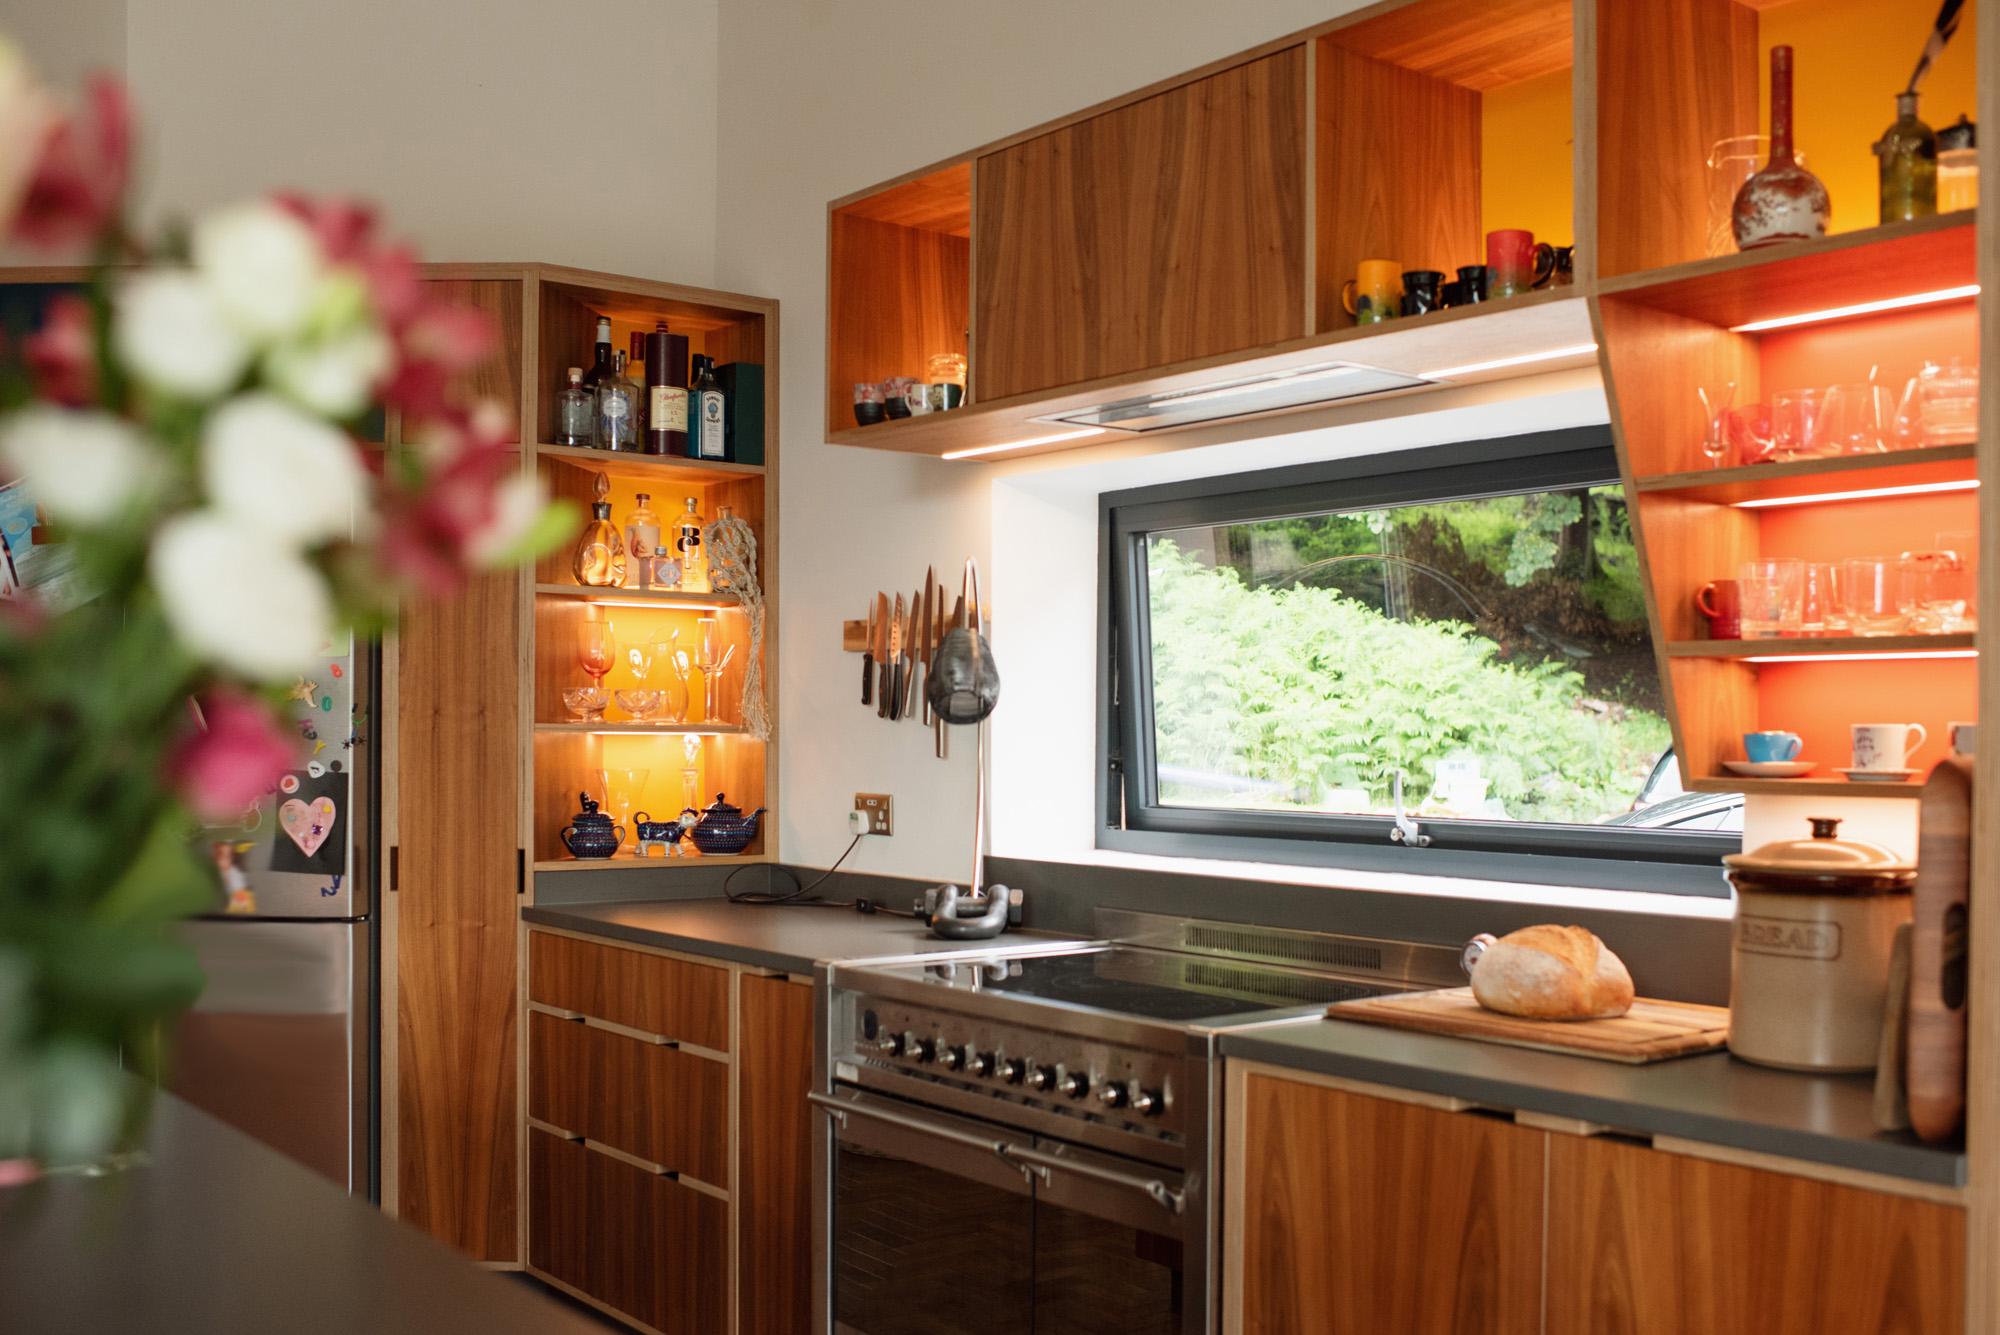 Walnut kitchen with picture window